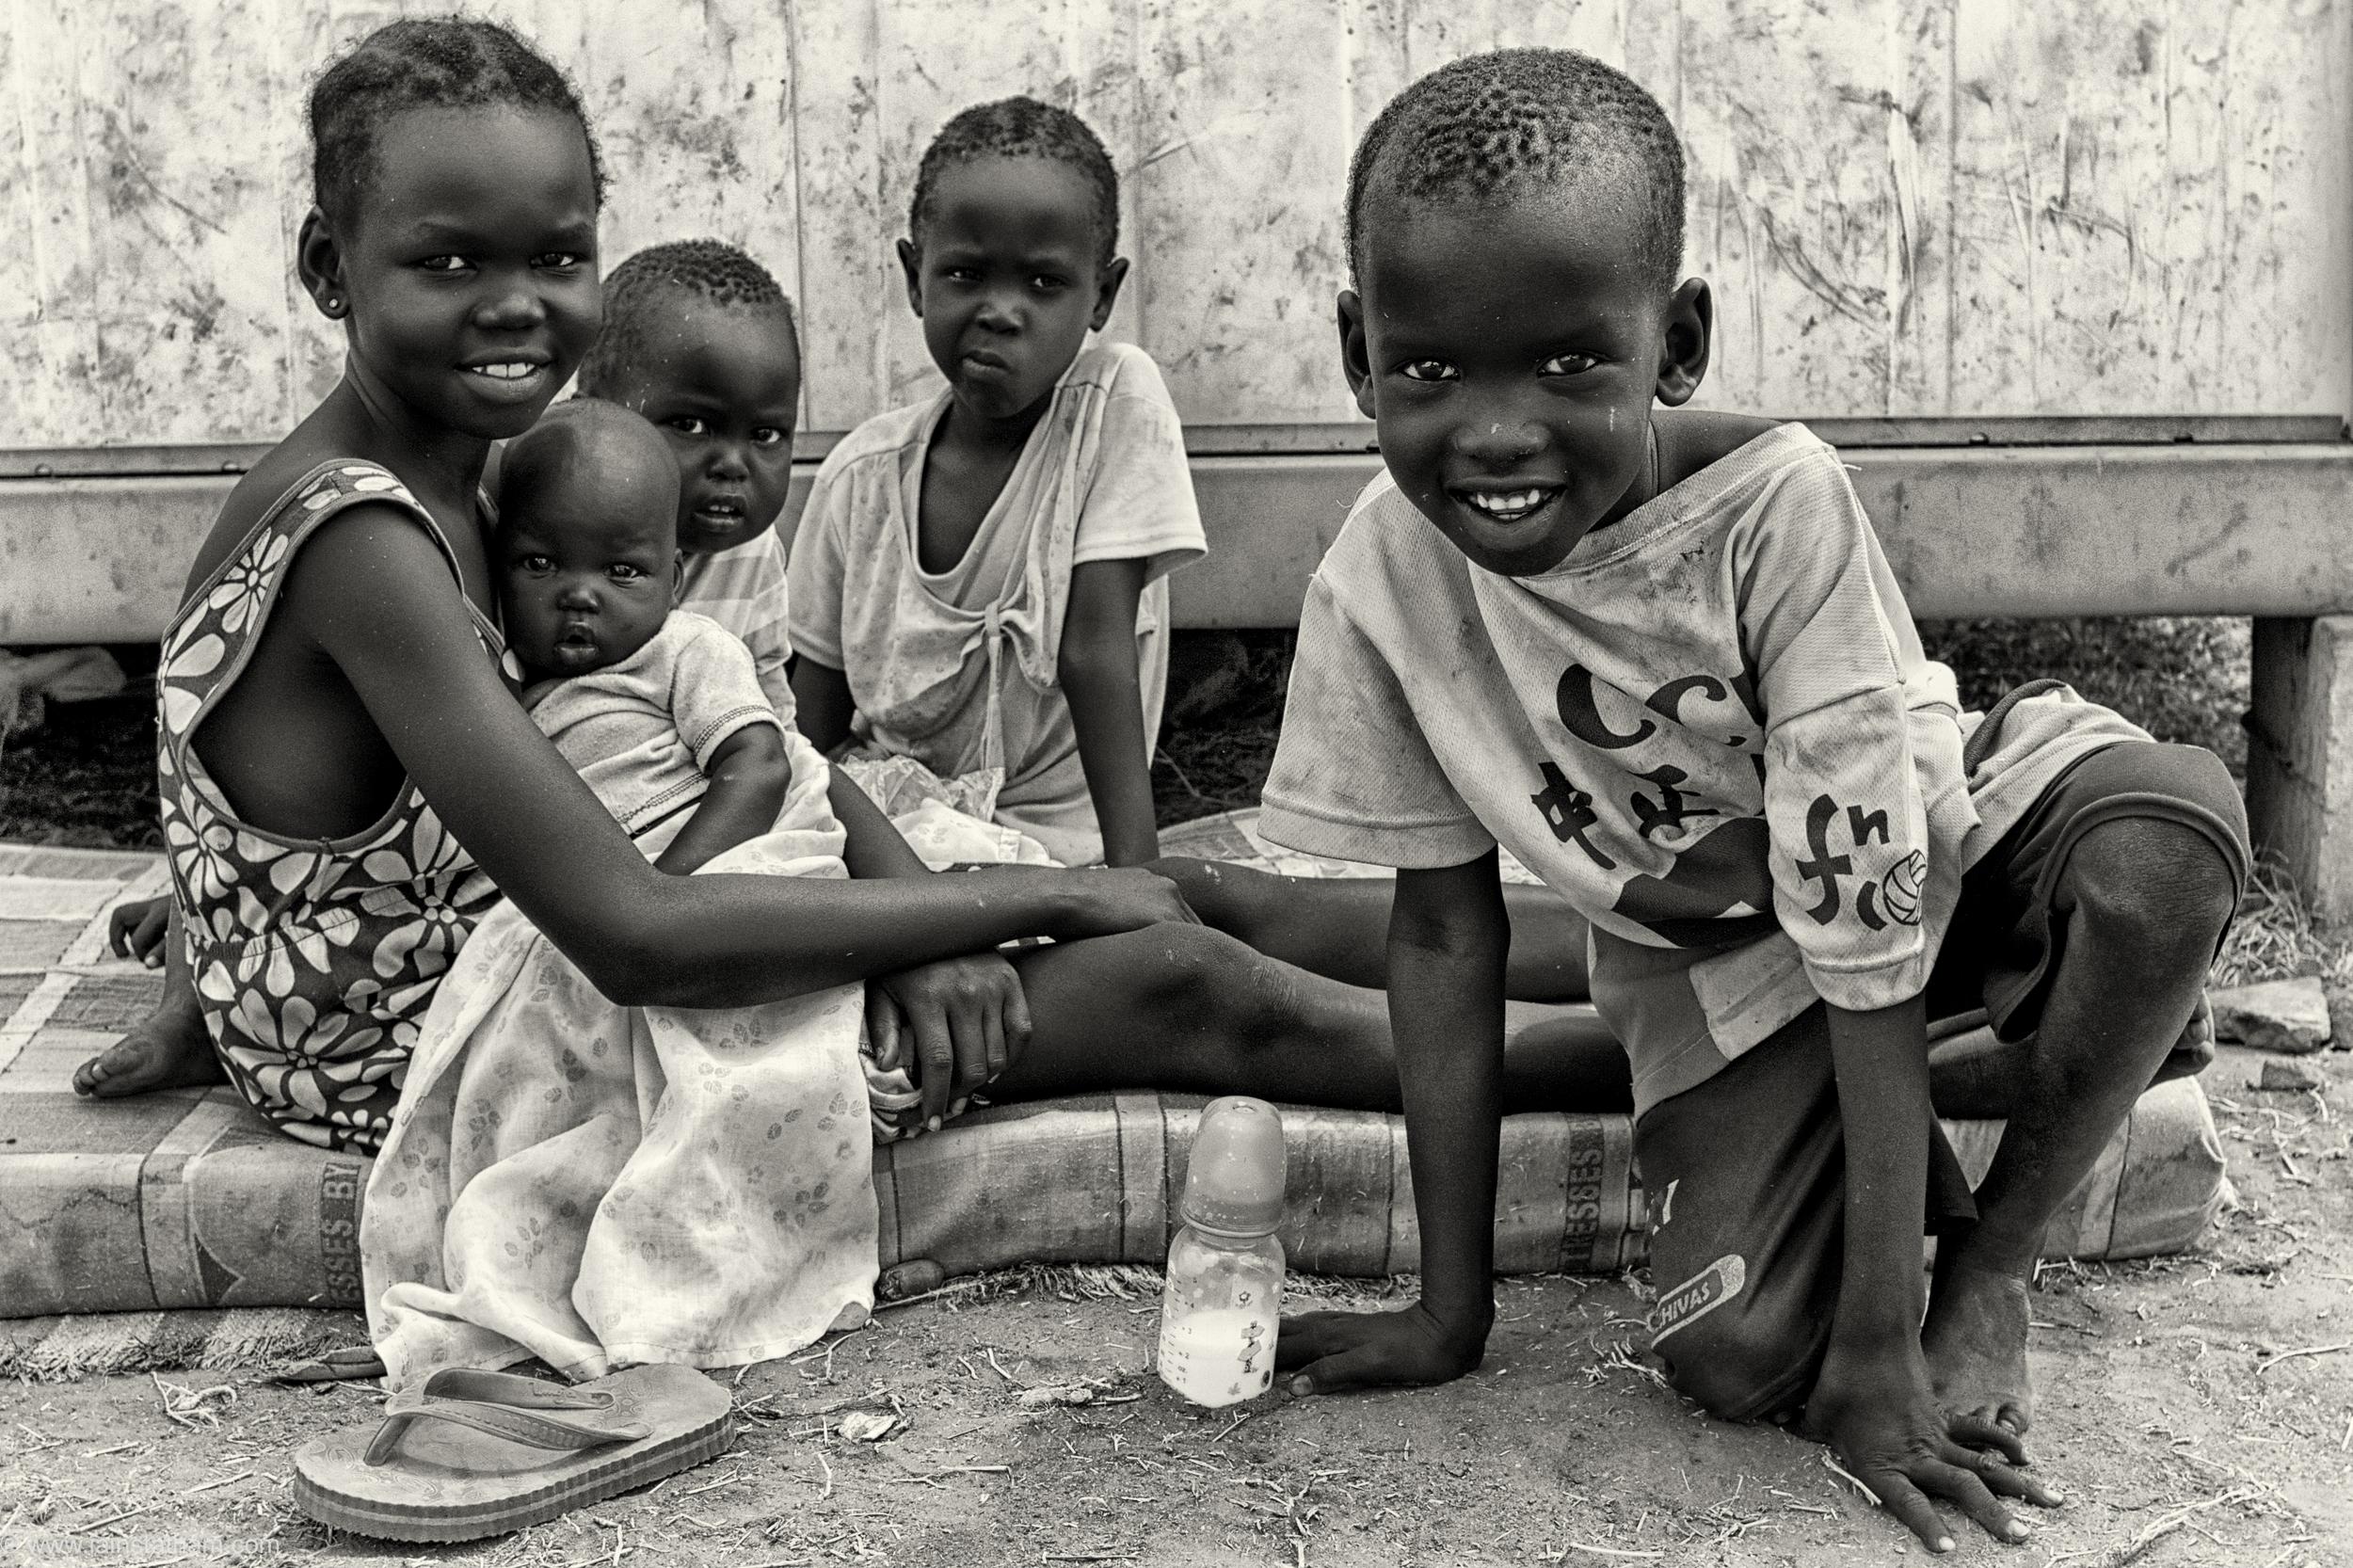 ug - south sudan refugees - dziapi - bw-12.jpg